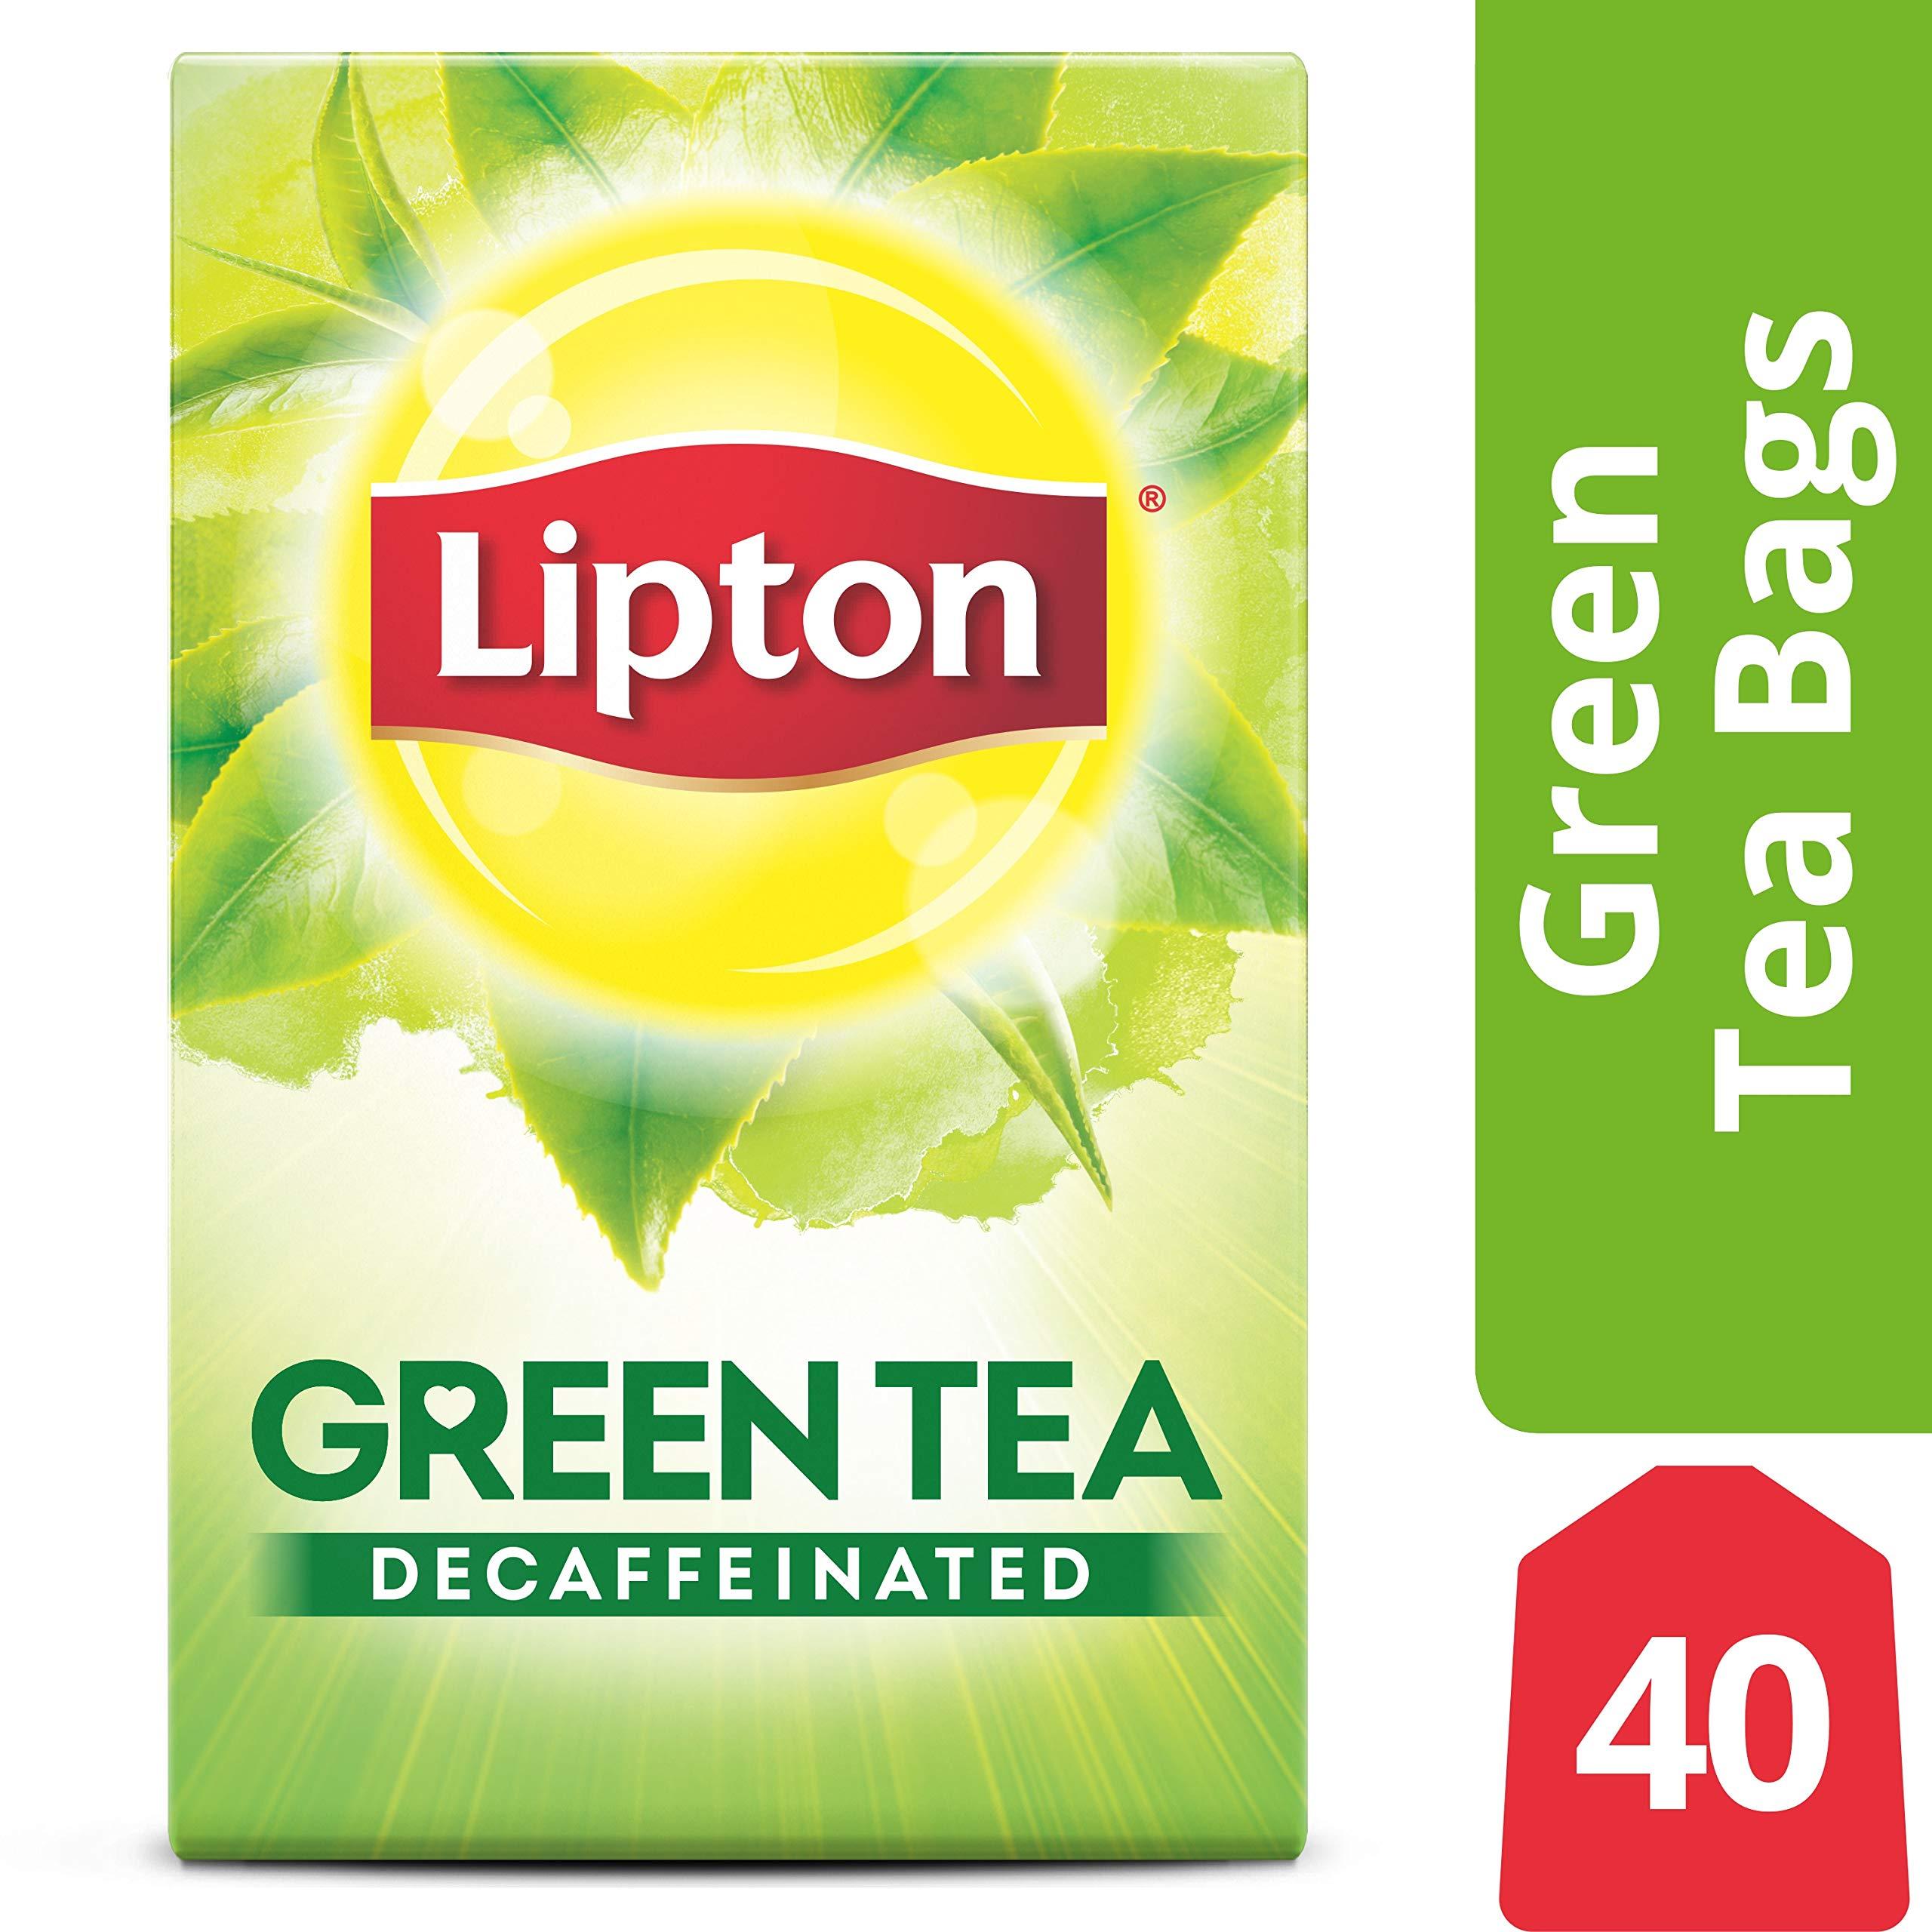 Lipton Green Tea Bags, Decaffeinated, 40 ct (pack of 6) by Lipton